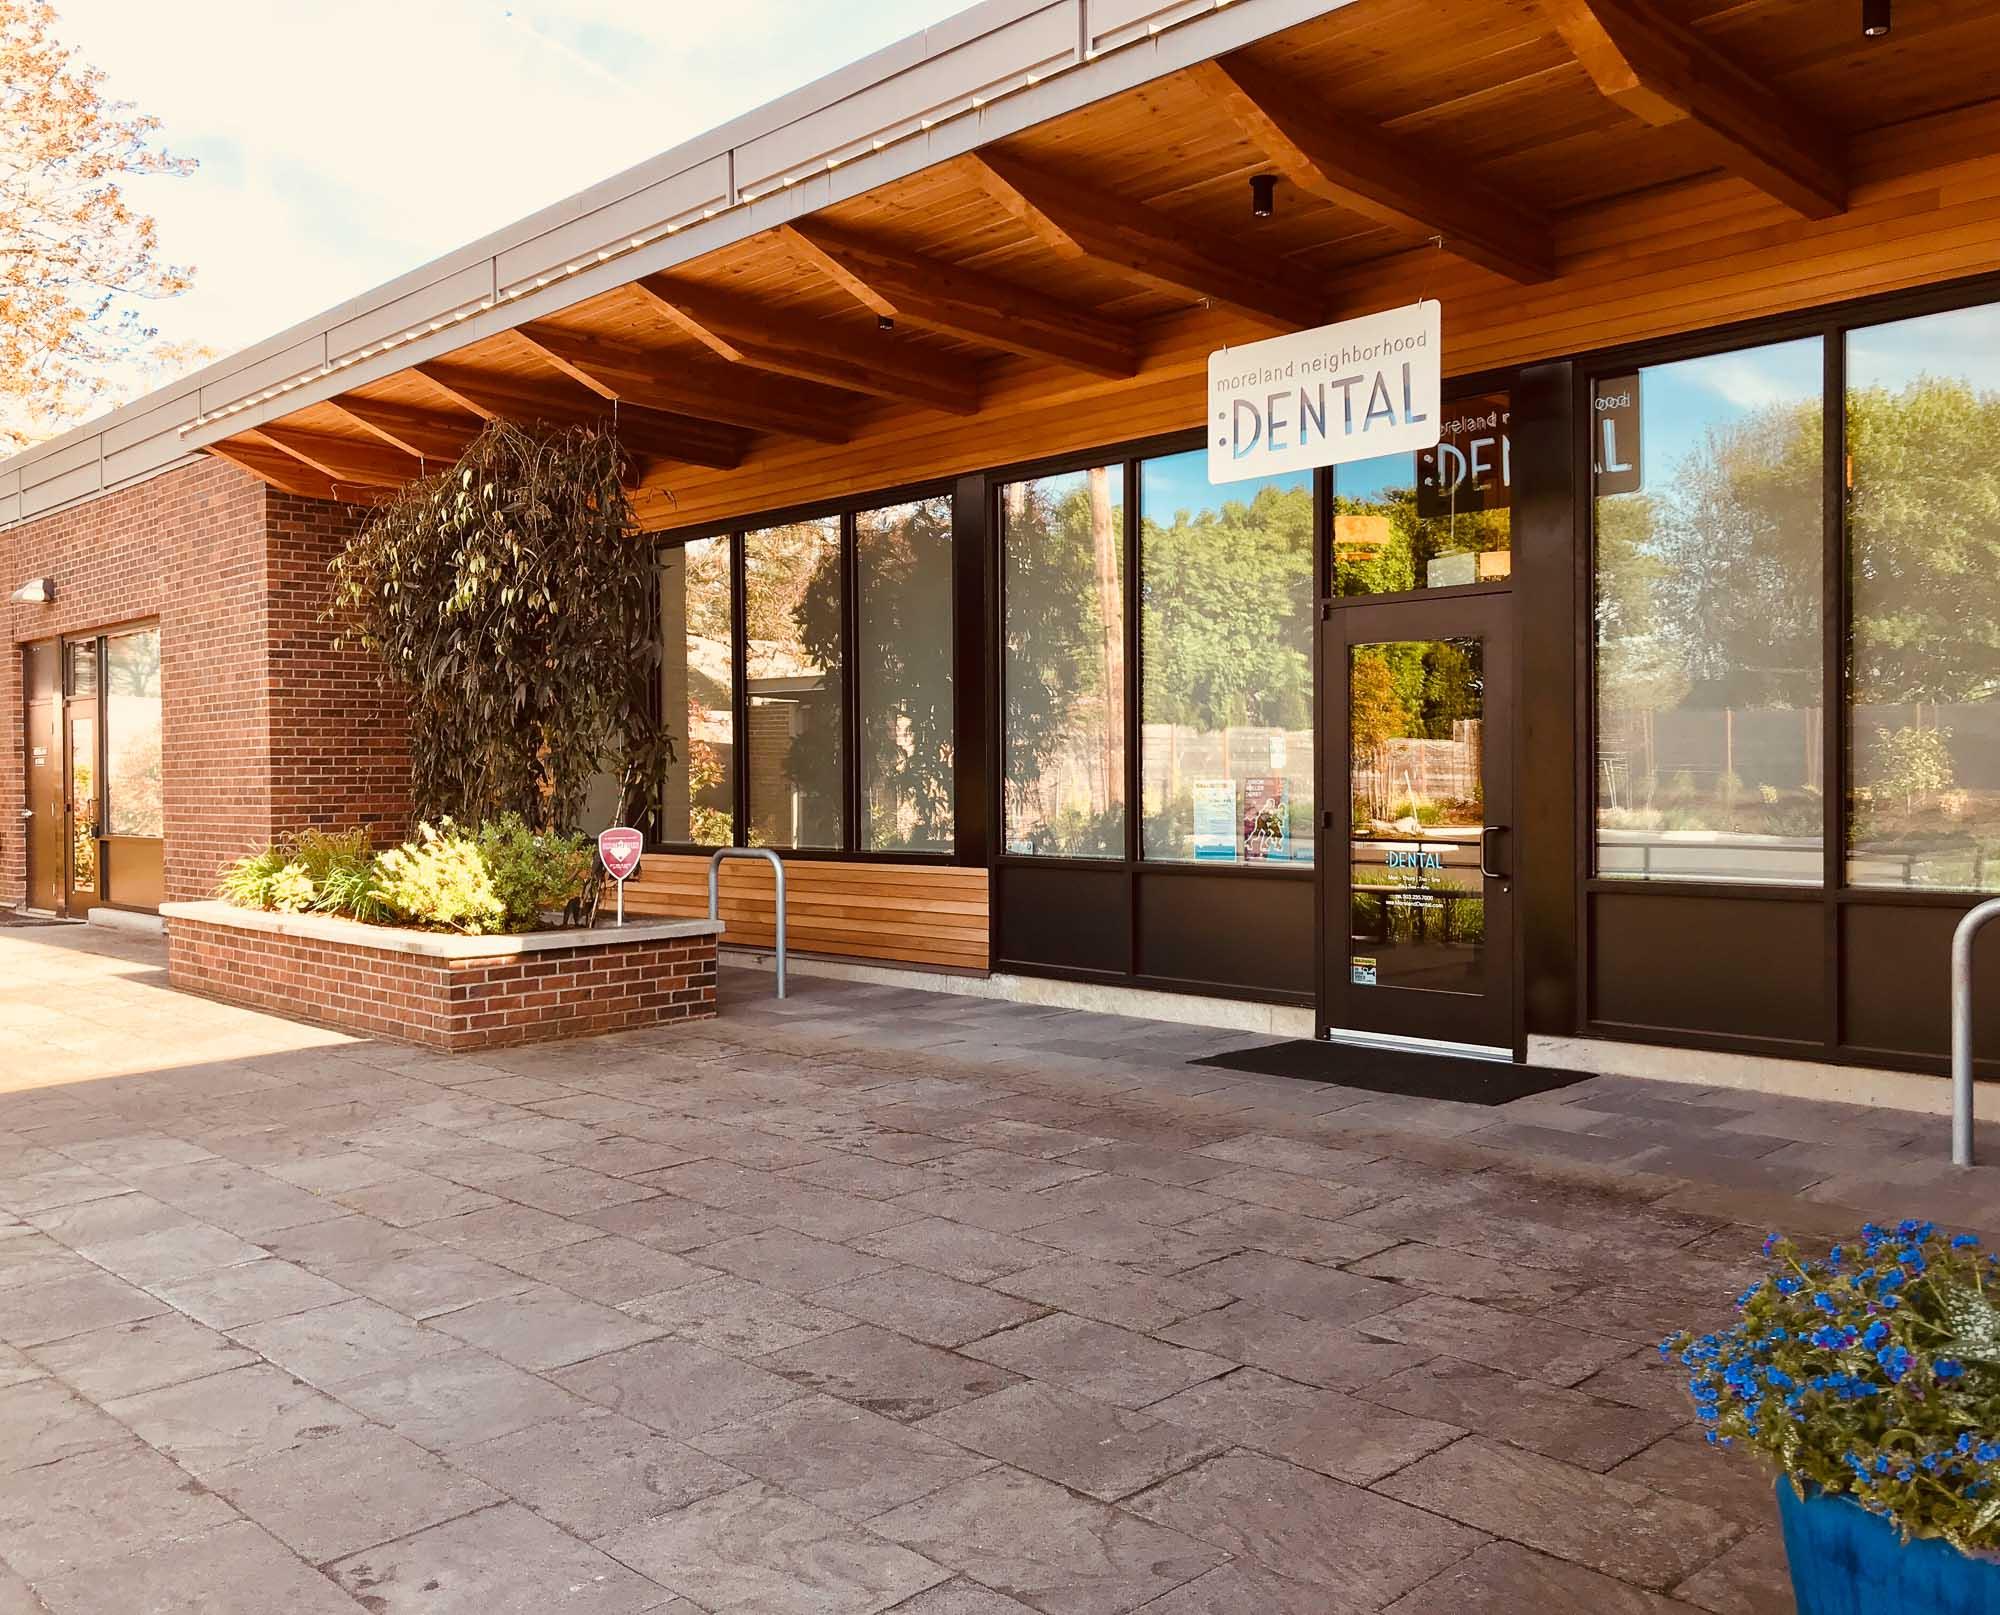 visit-sellwood-moreland-business-alliance_moreland-neighborhood-dental-2.jpg